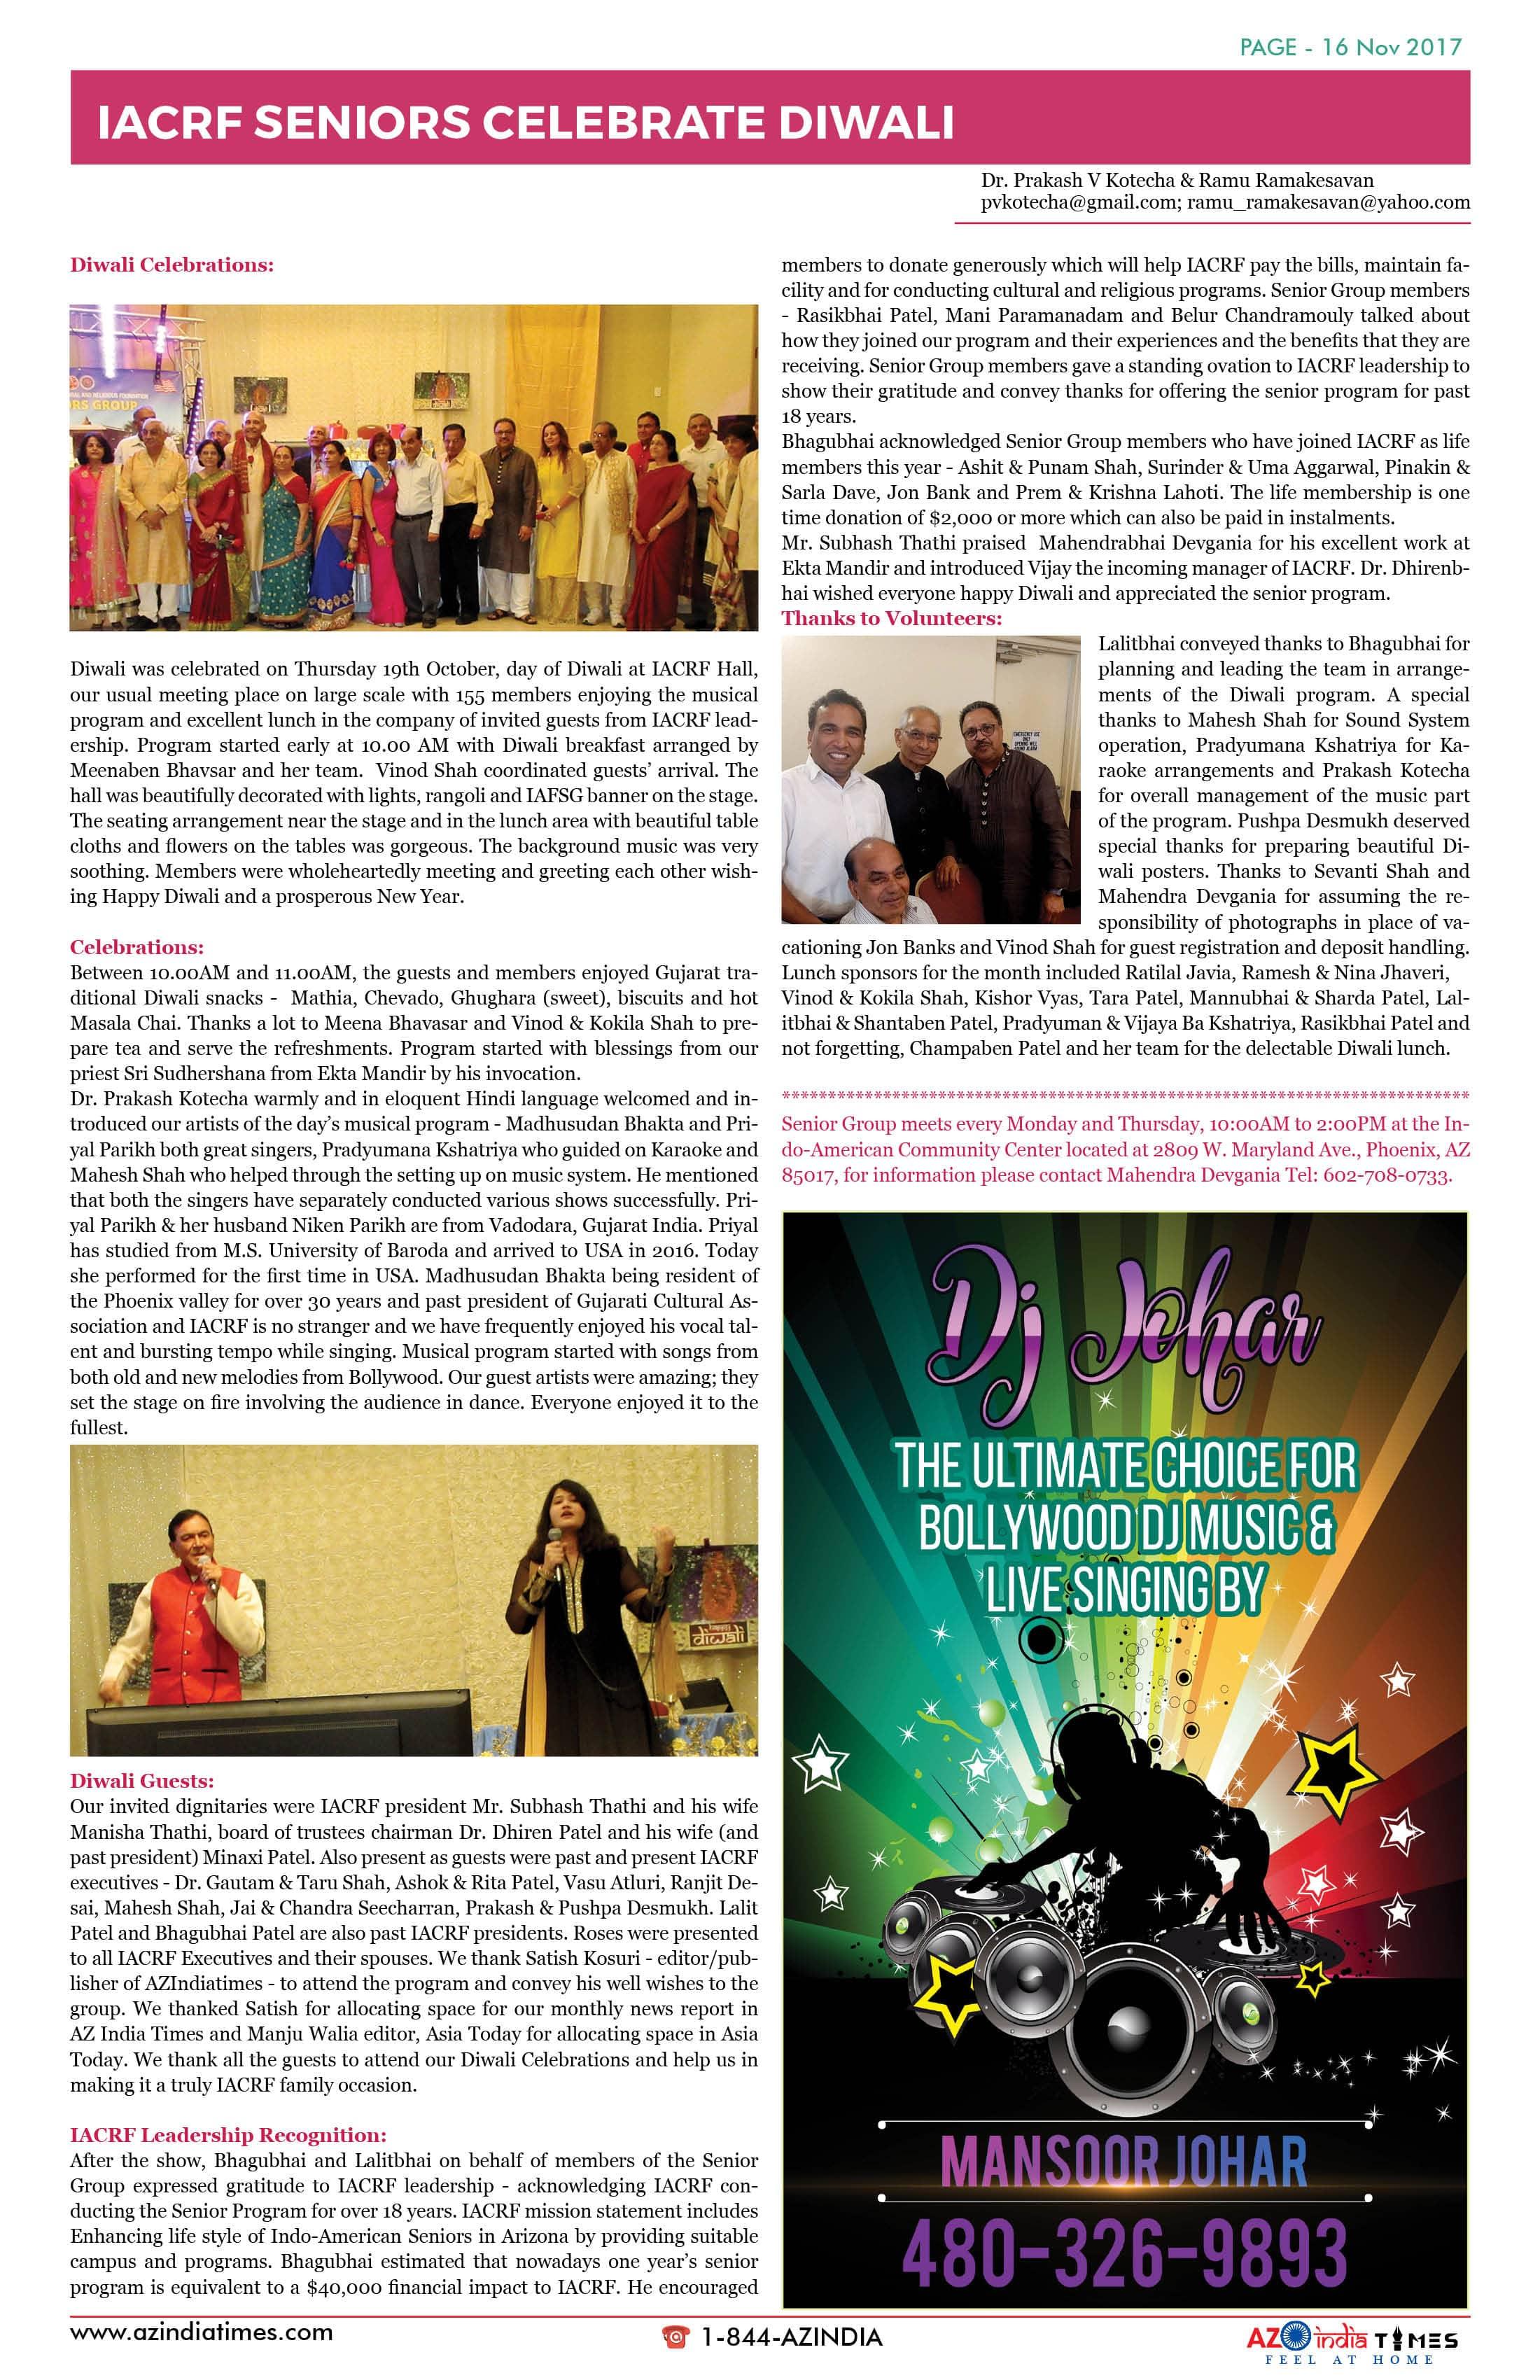 AZ INDIA TIMES NOVEMBER EDITION16